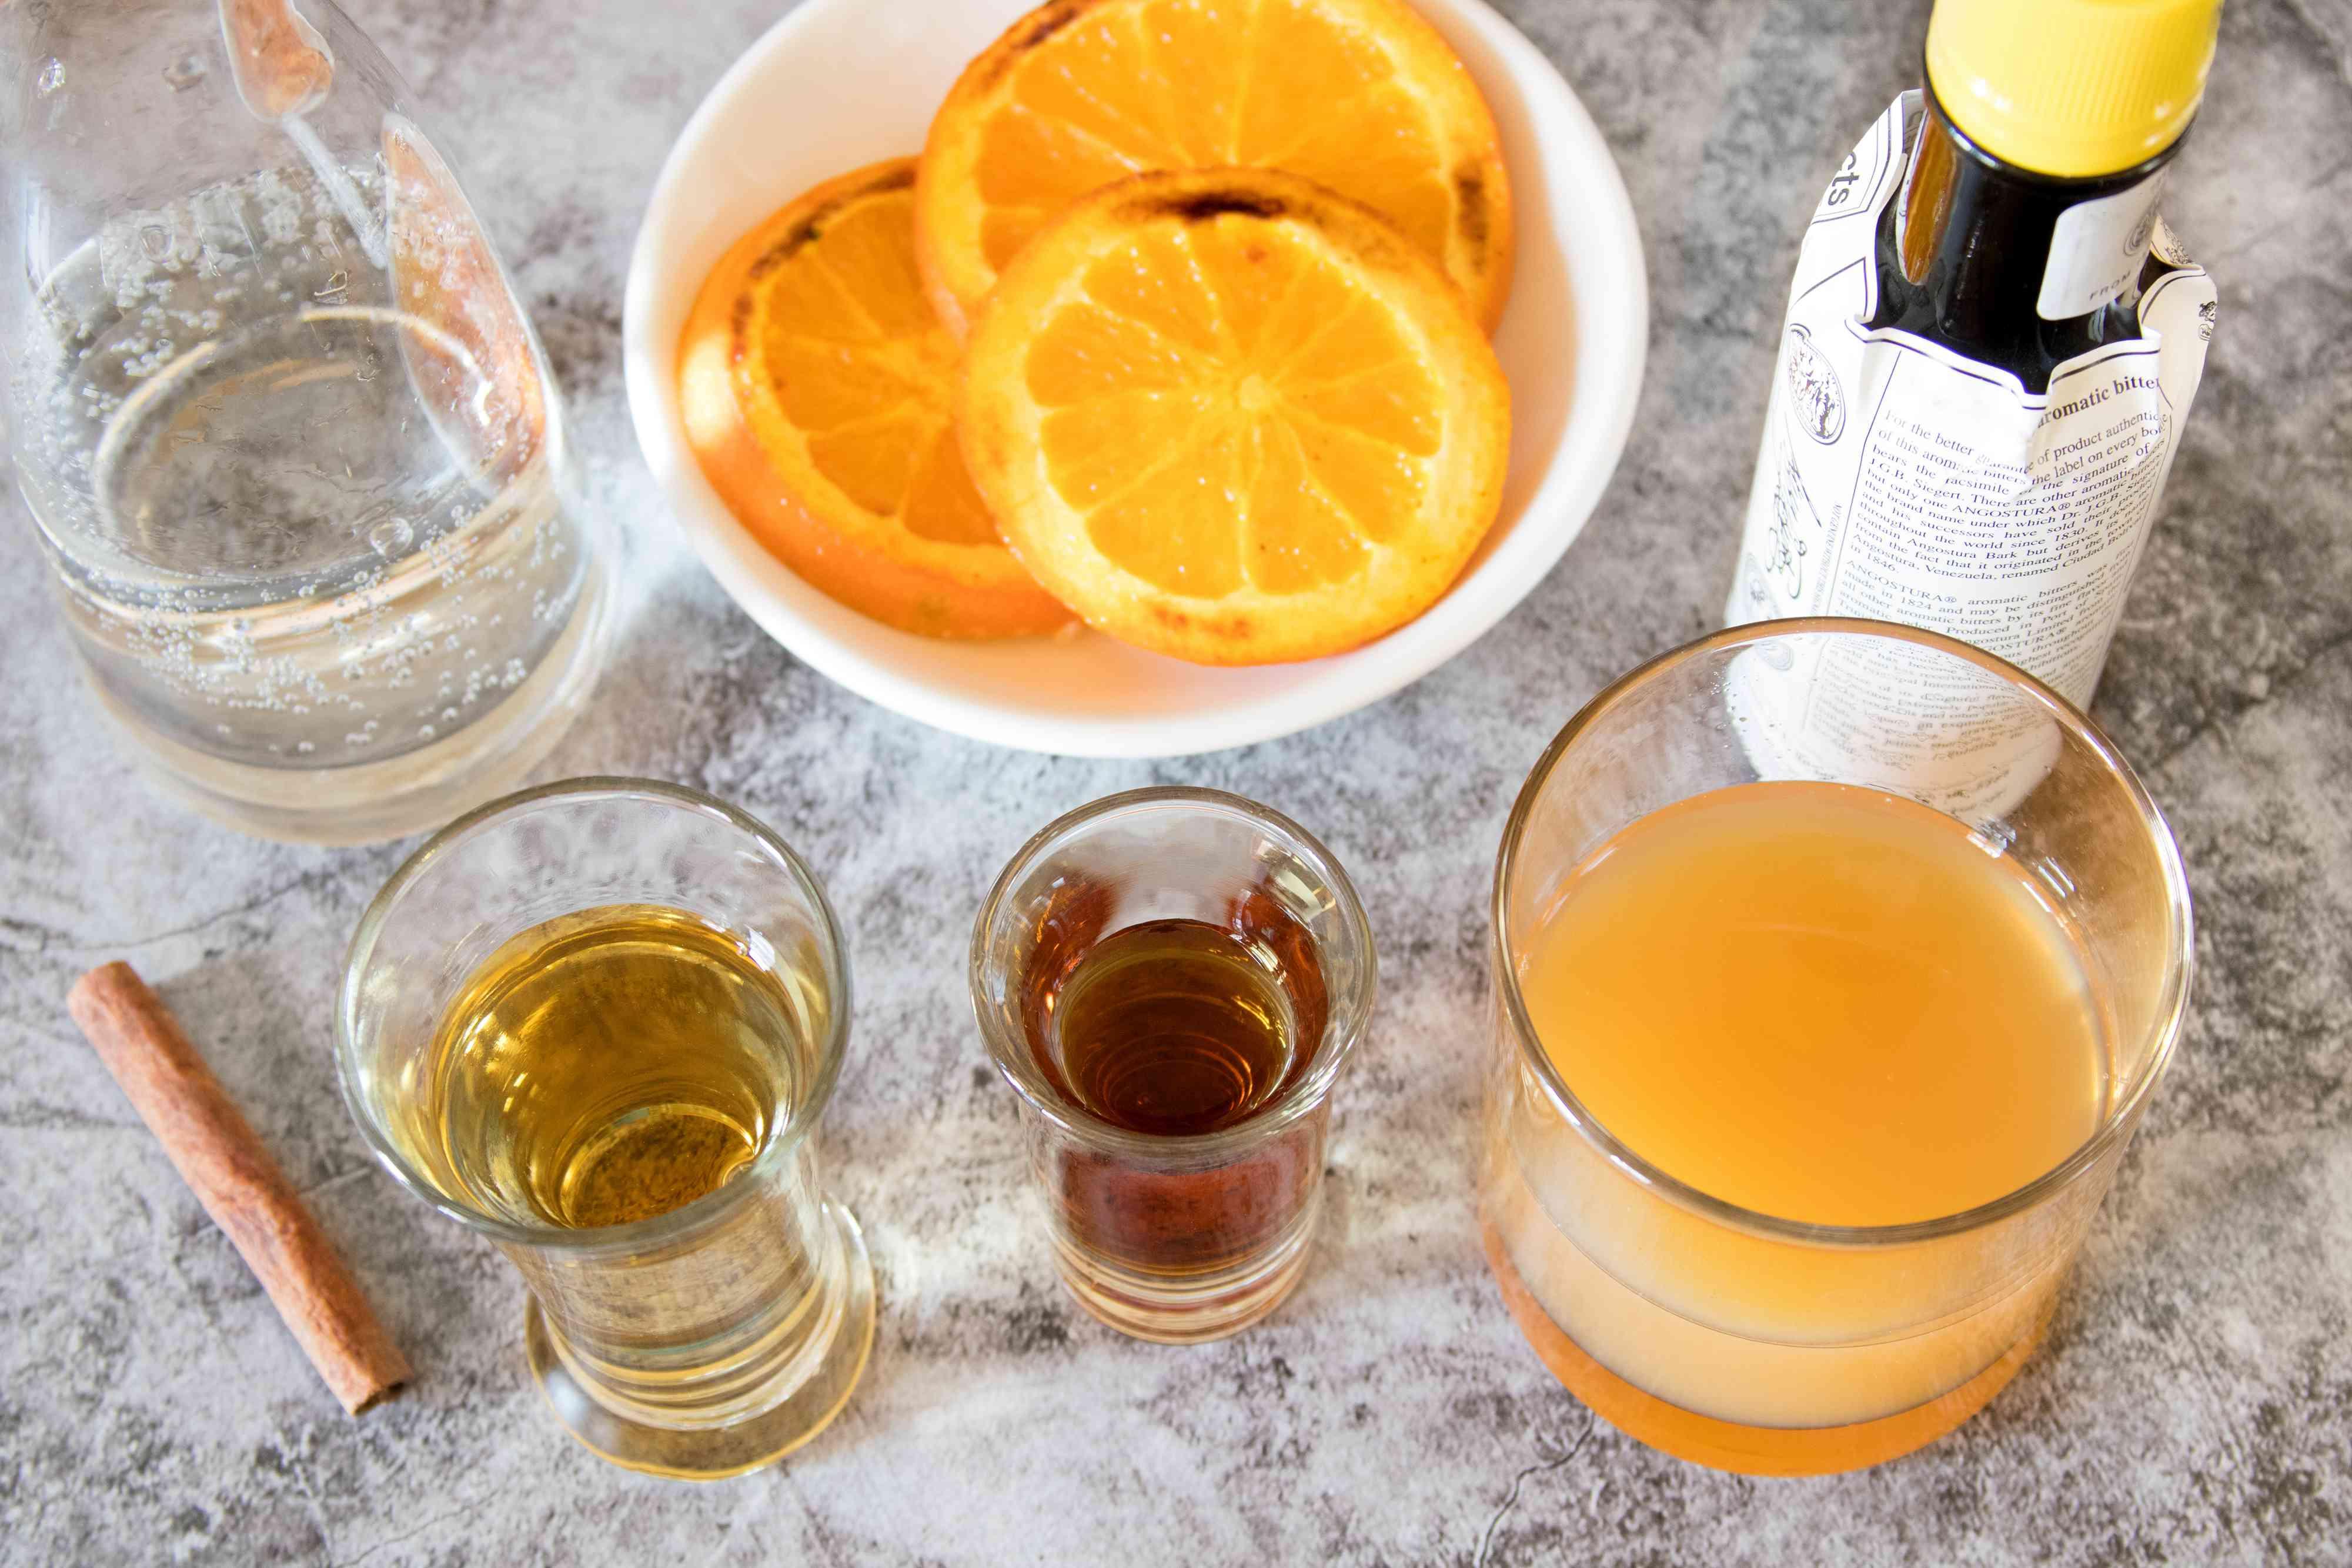 Spiked Apple Cider With Caramelized Oranges